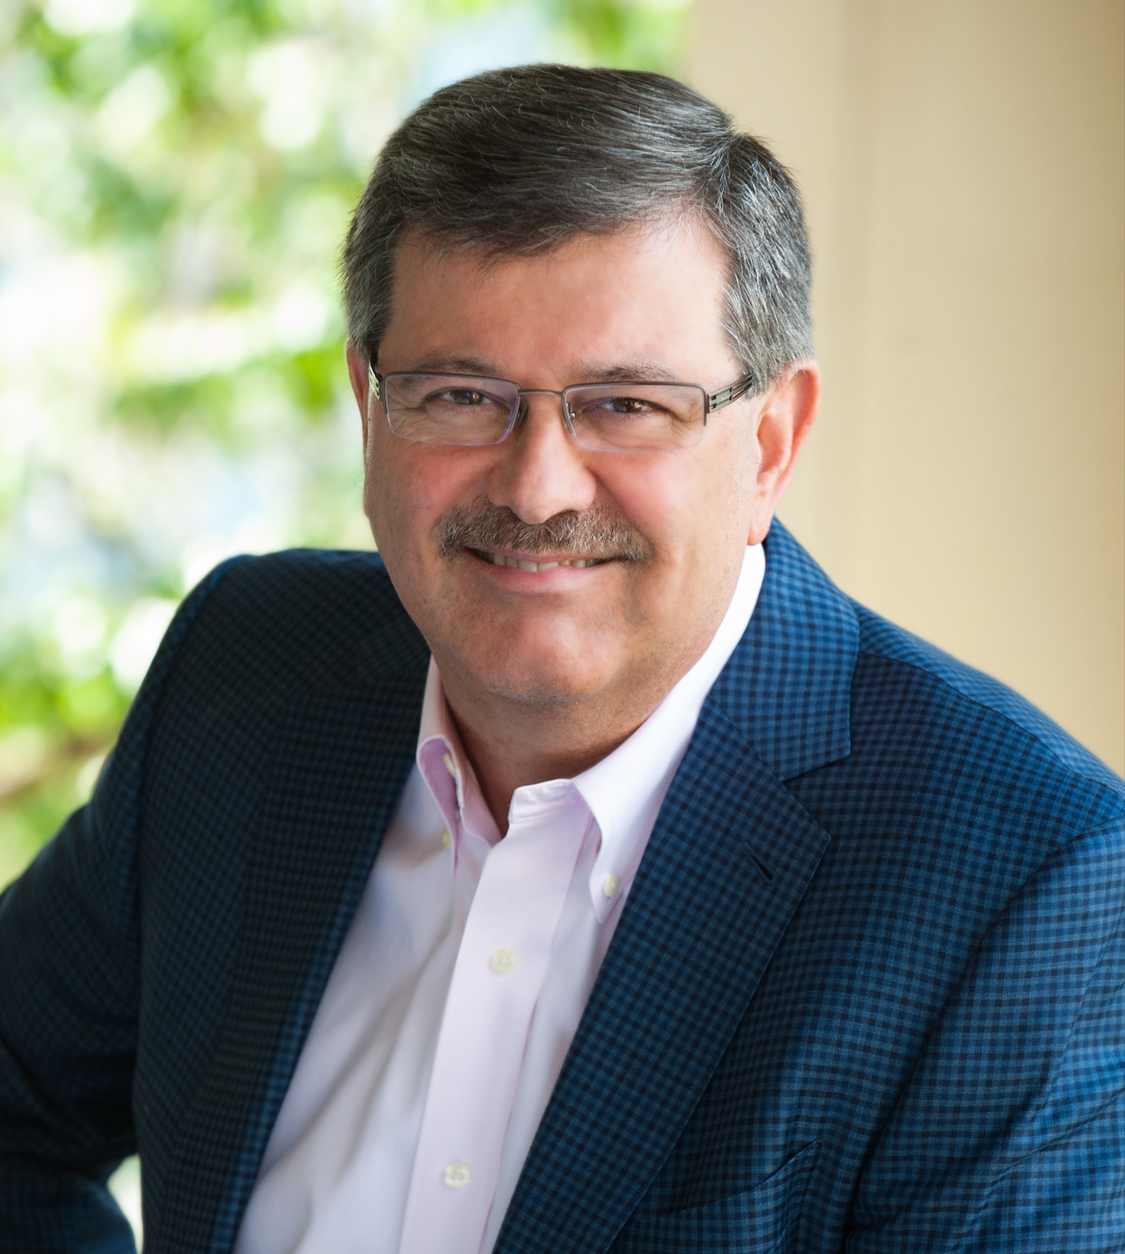 John Kulcha, DDS